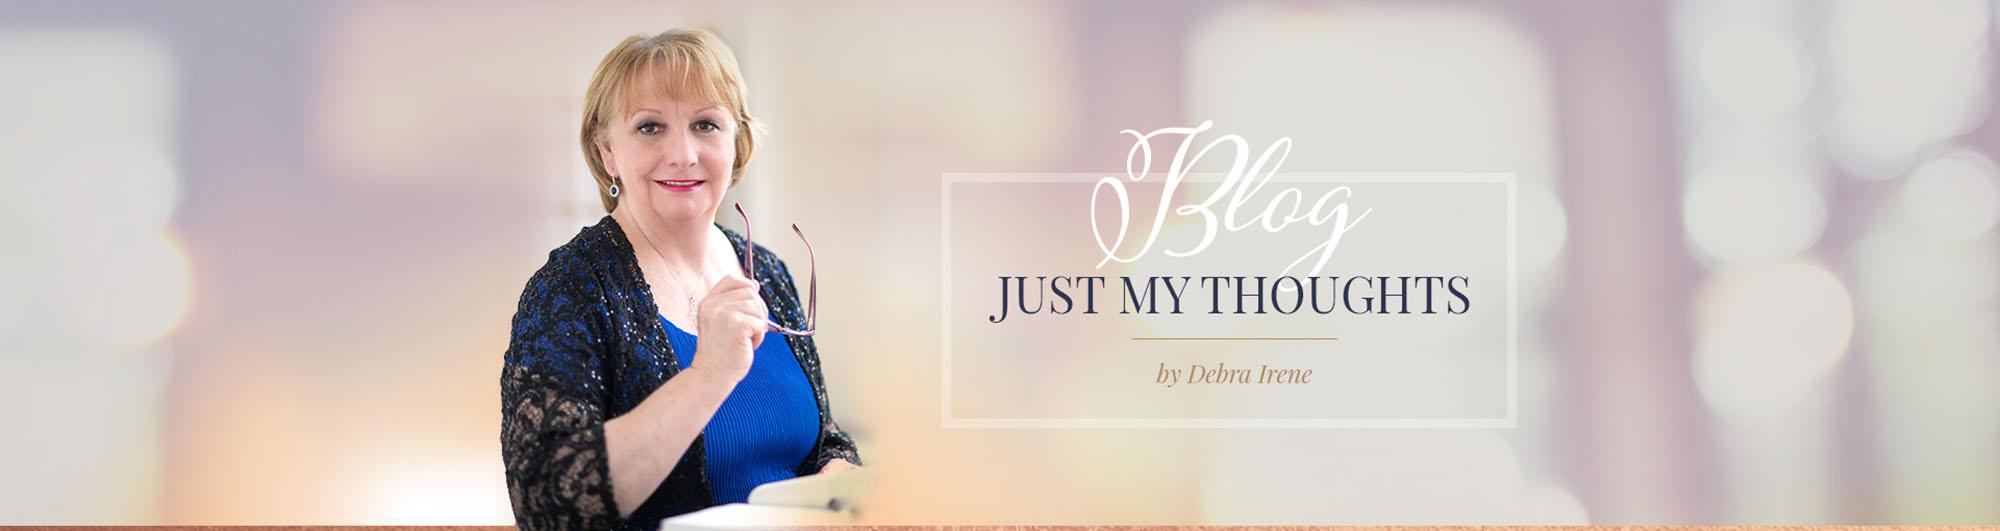 Debra Irene's Blog - Just My Thoughts